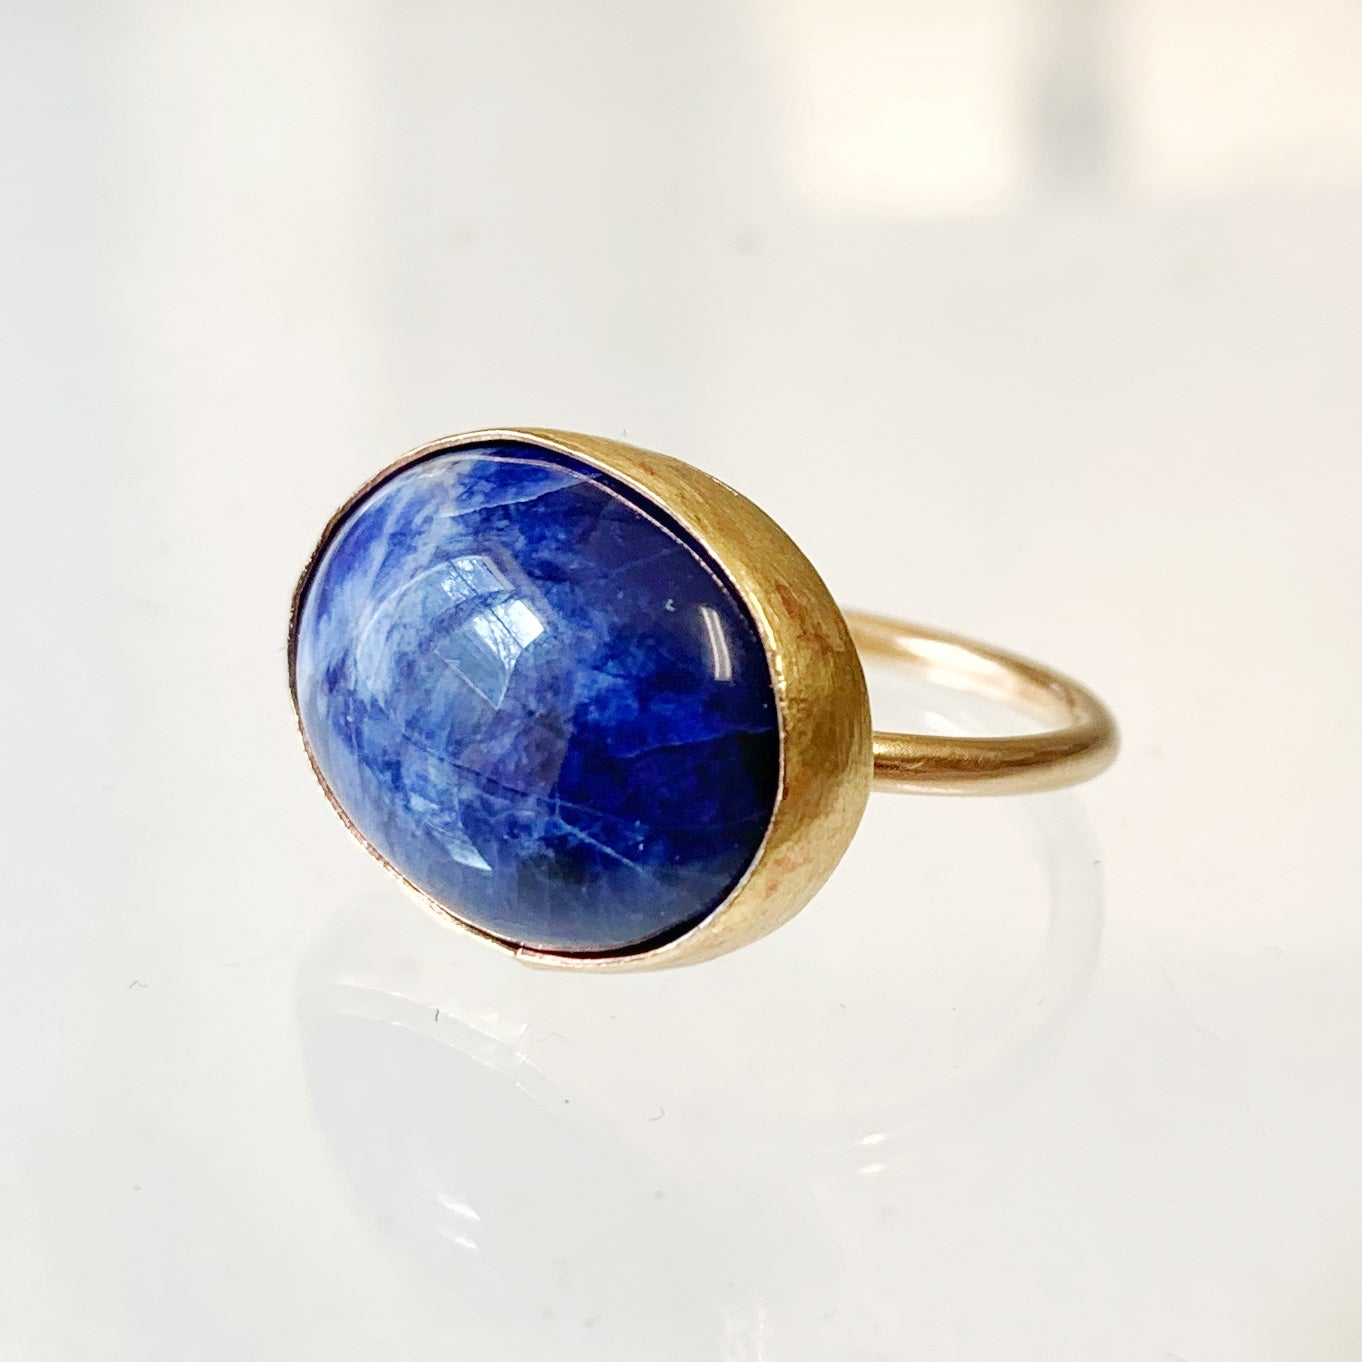 Image of Sodalite Ring